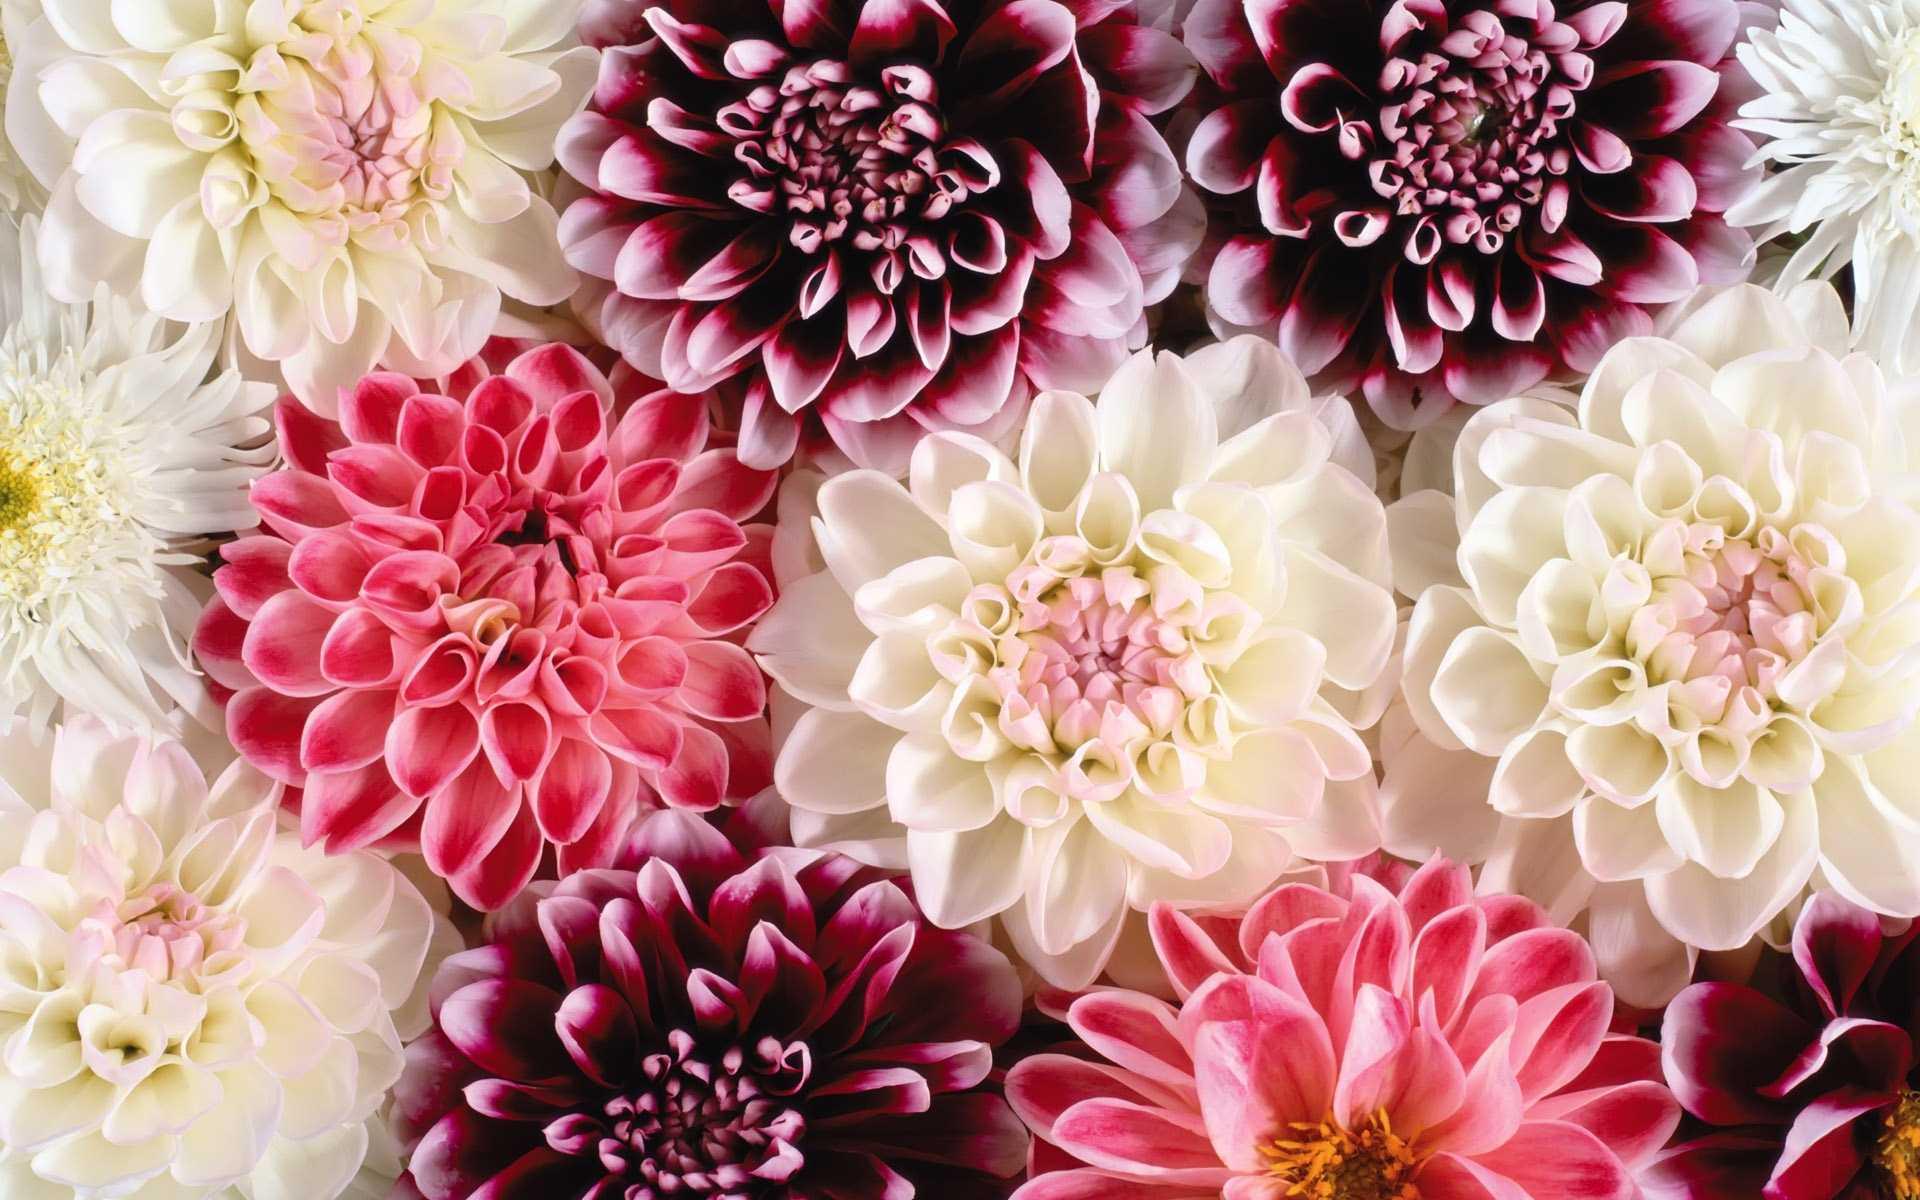 Flower Wallpapers Tumblrvintage Flower Wallpaper Tumblrflower